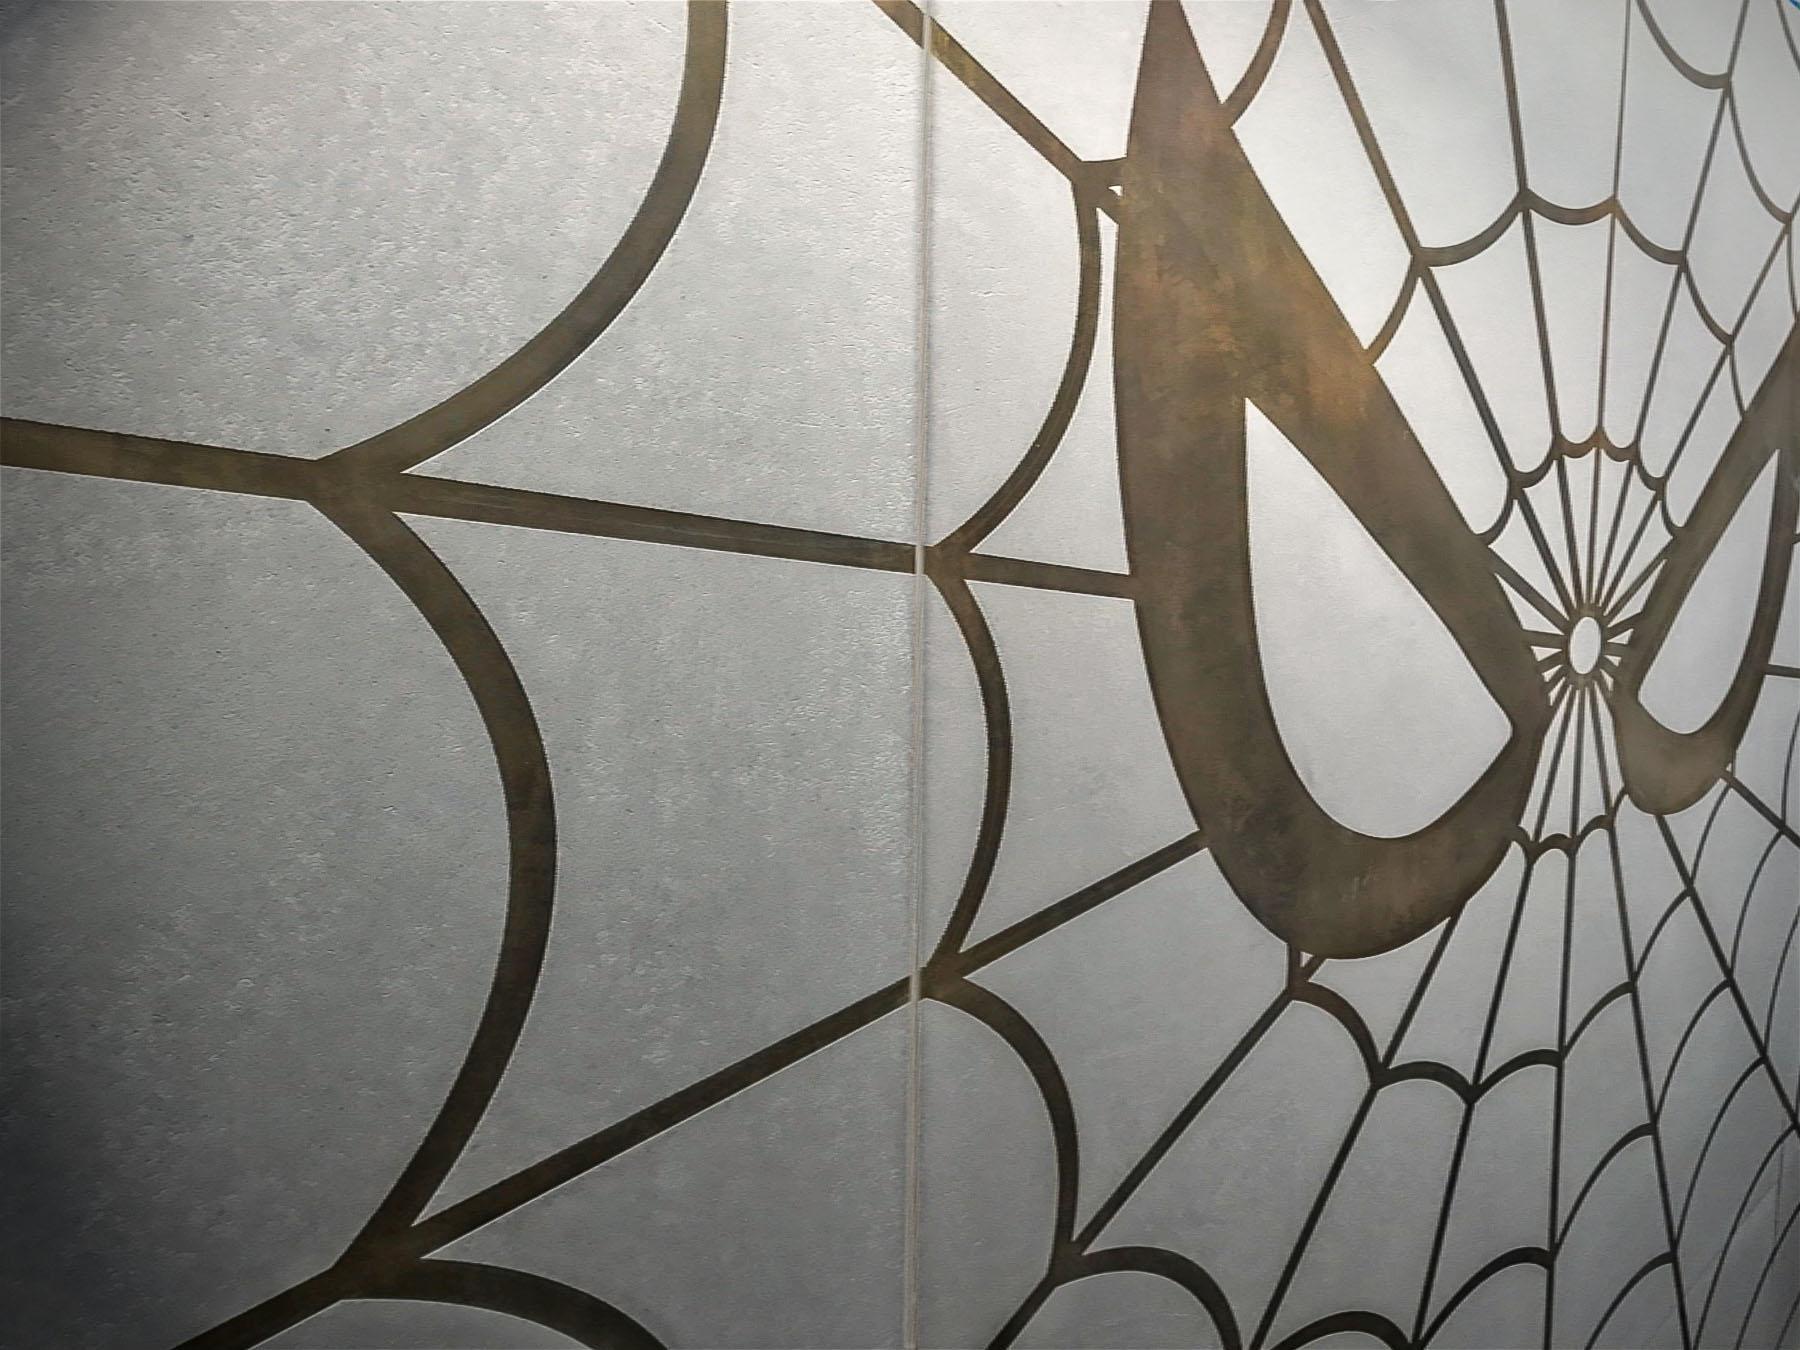 Th_0004_Spiderman.jpg